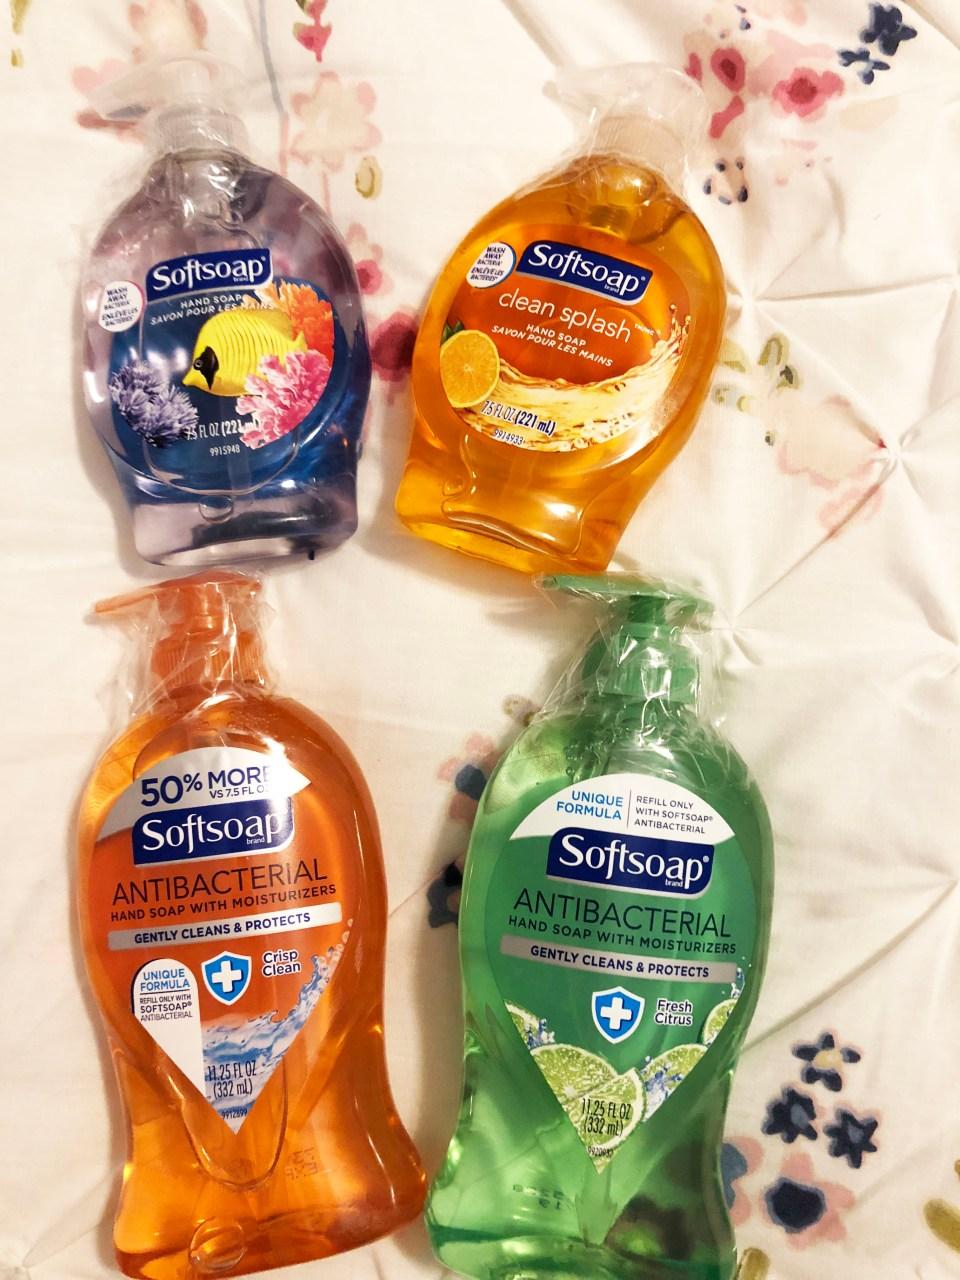 Softsoap AntiBacterial Soap